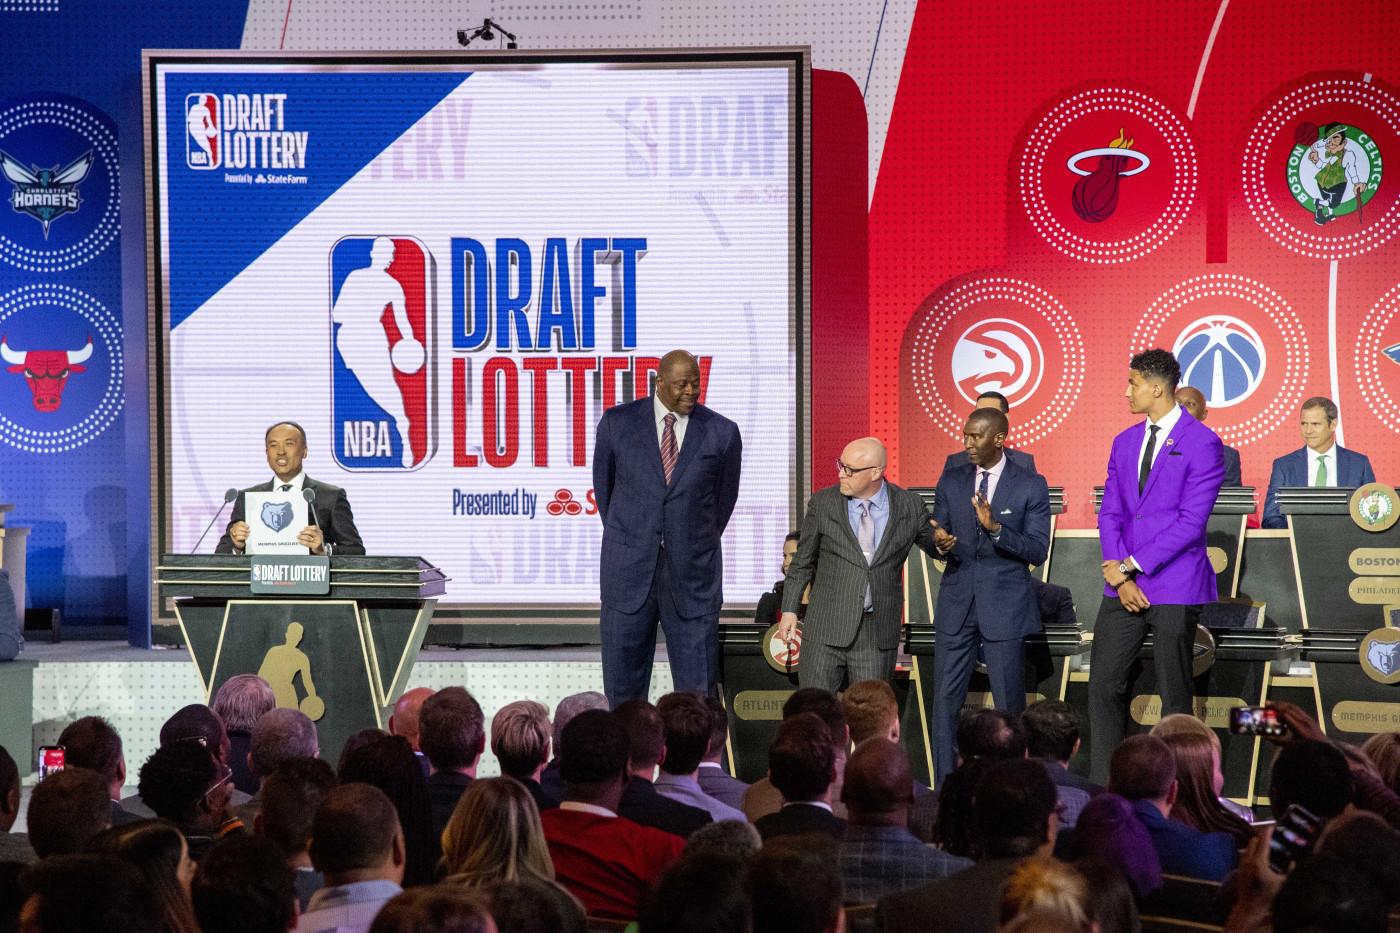 Patrick Ewing NBA Draft Lottery 2019 David Griffin